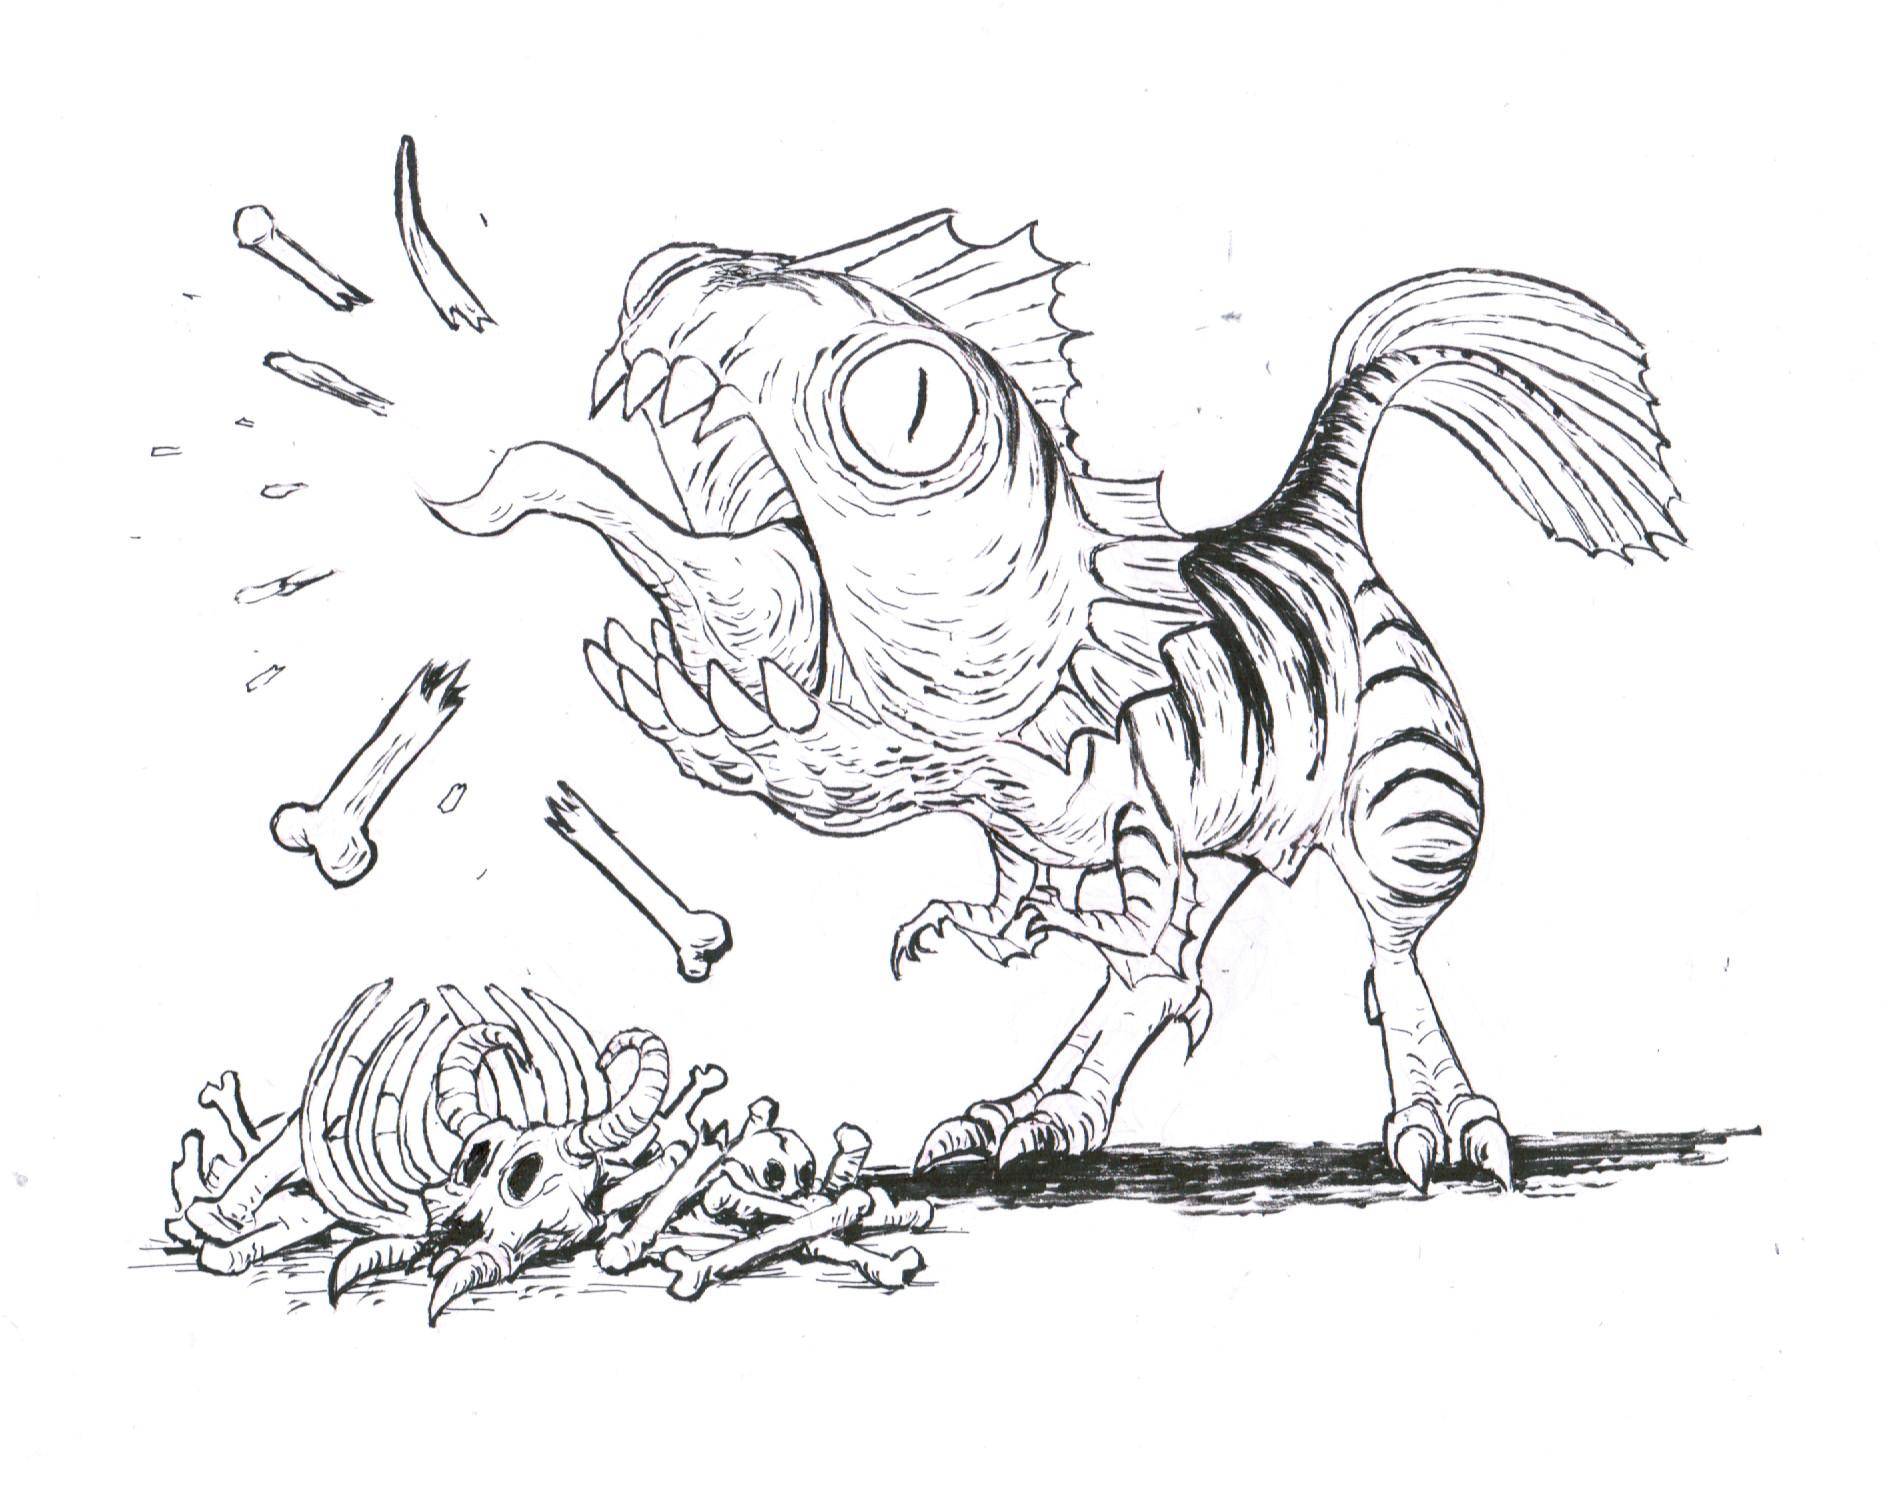 The piranhasaurus loved to chew on piles of broken bones.